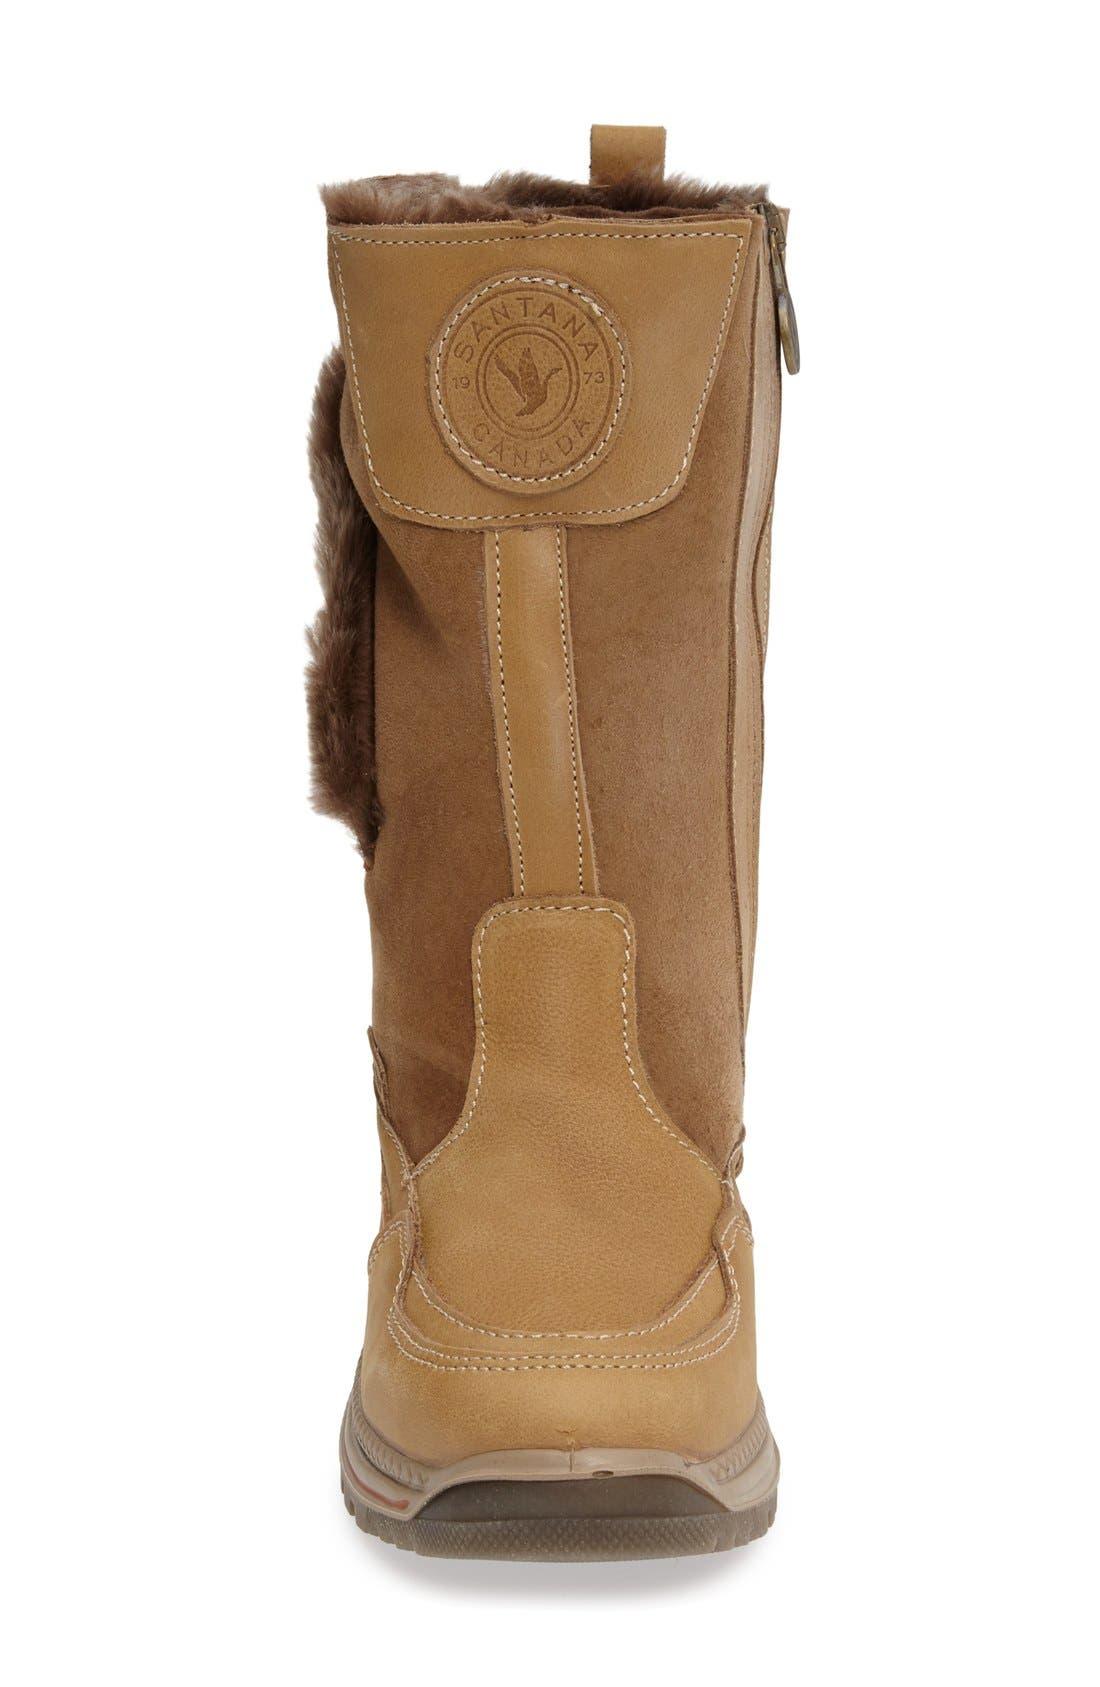 Alternate Image 3  - Santana Canada Seraphine Genuine Shearling Waterproof Winter Boot (Women) (Wide Calf)